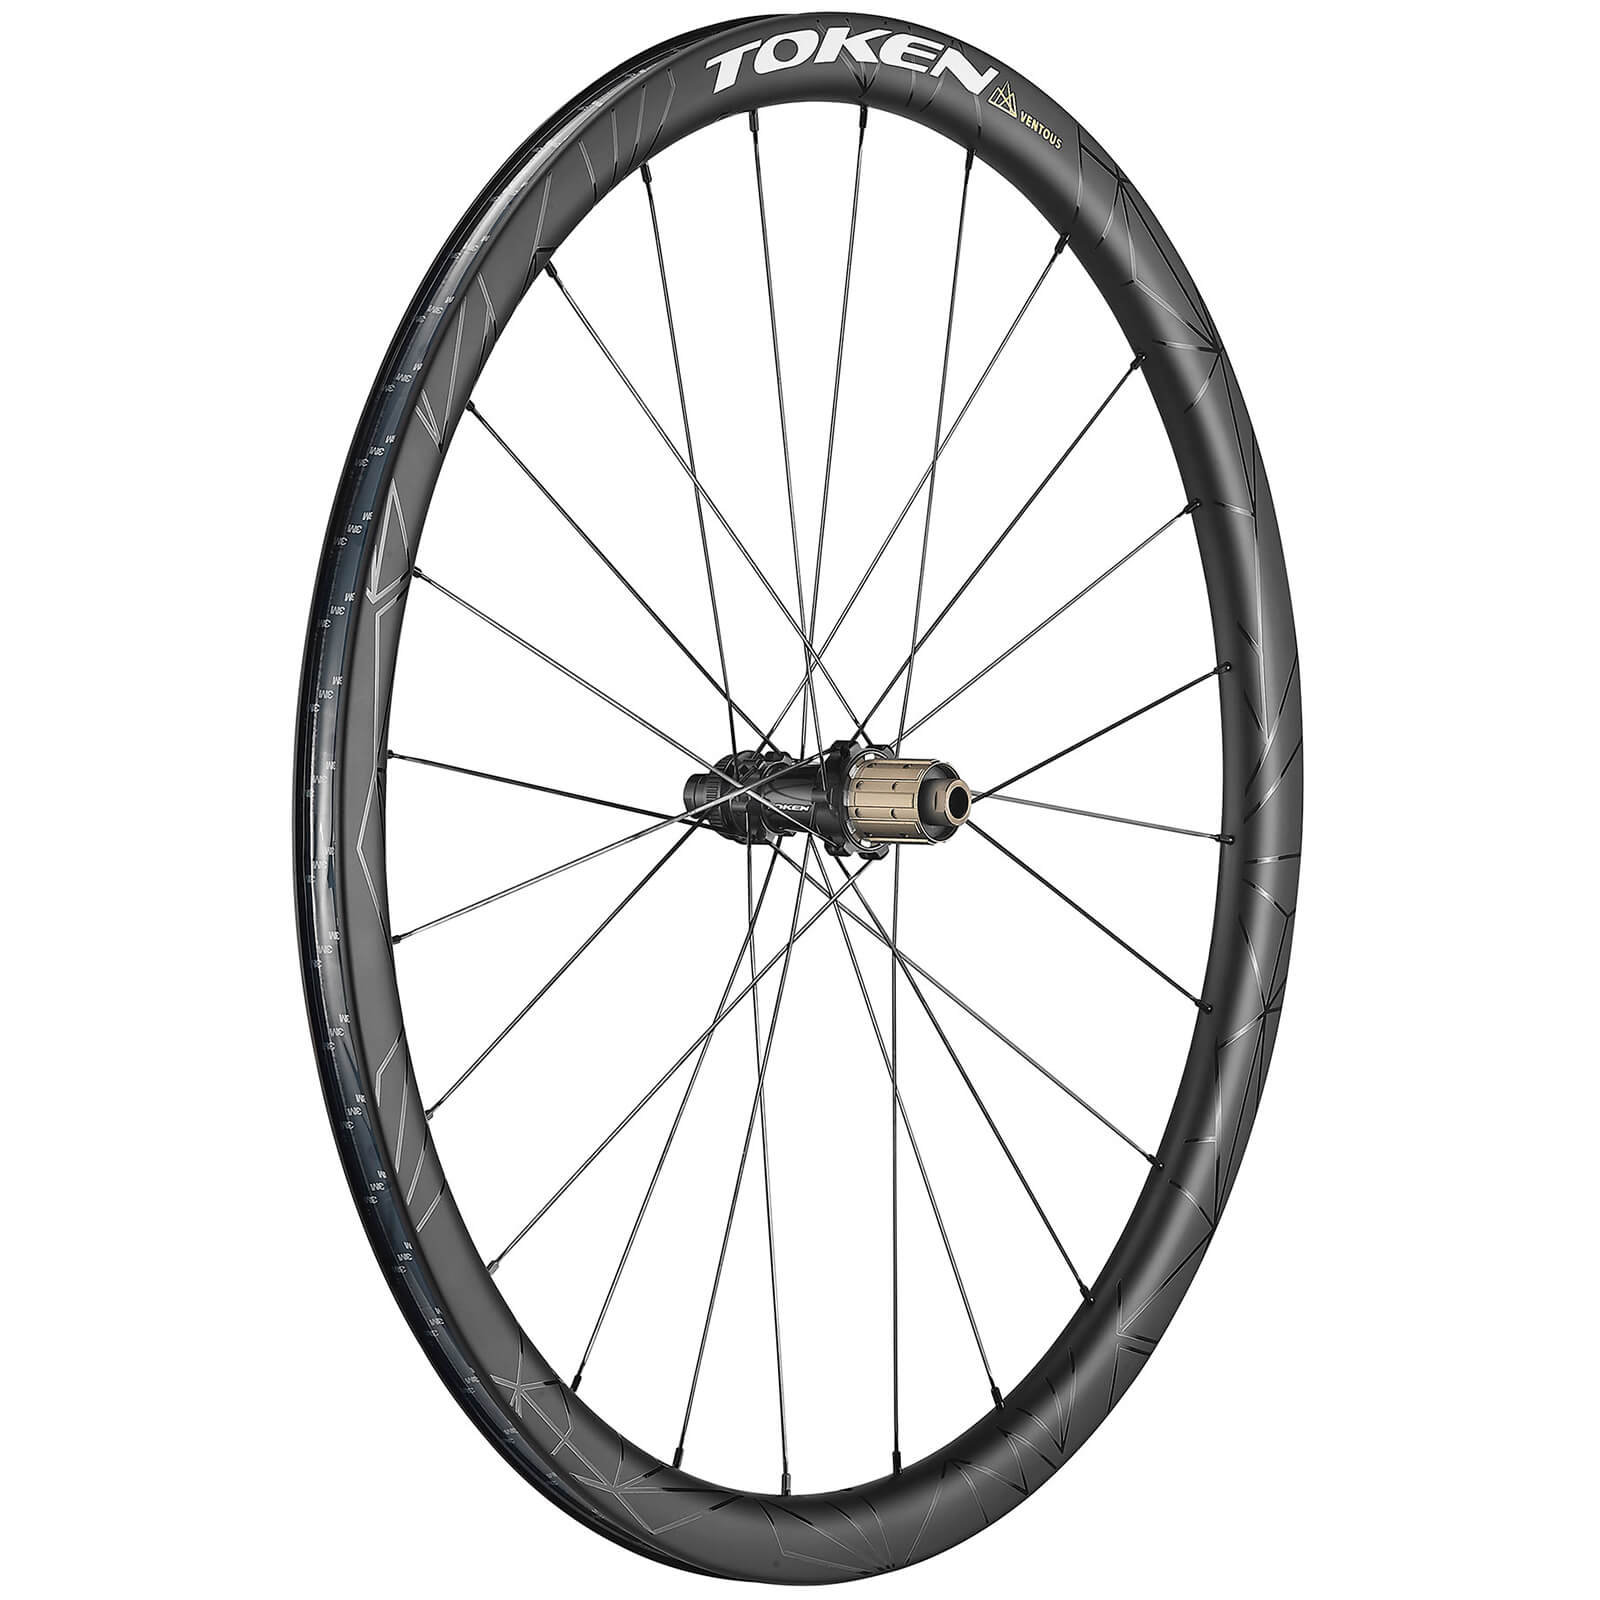 Token Ventous Disc Prime Carbon Tubeless Ready Wheelset - Shimano